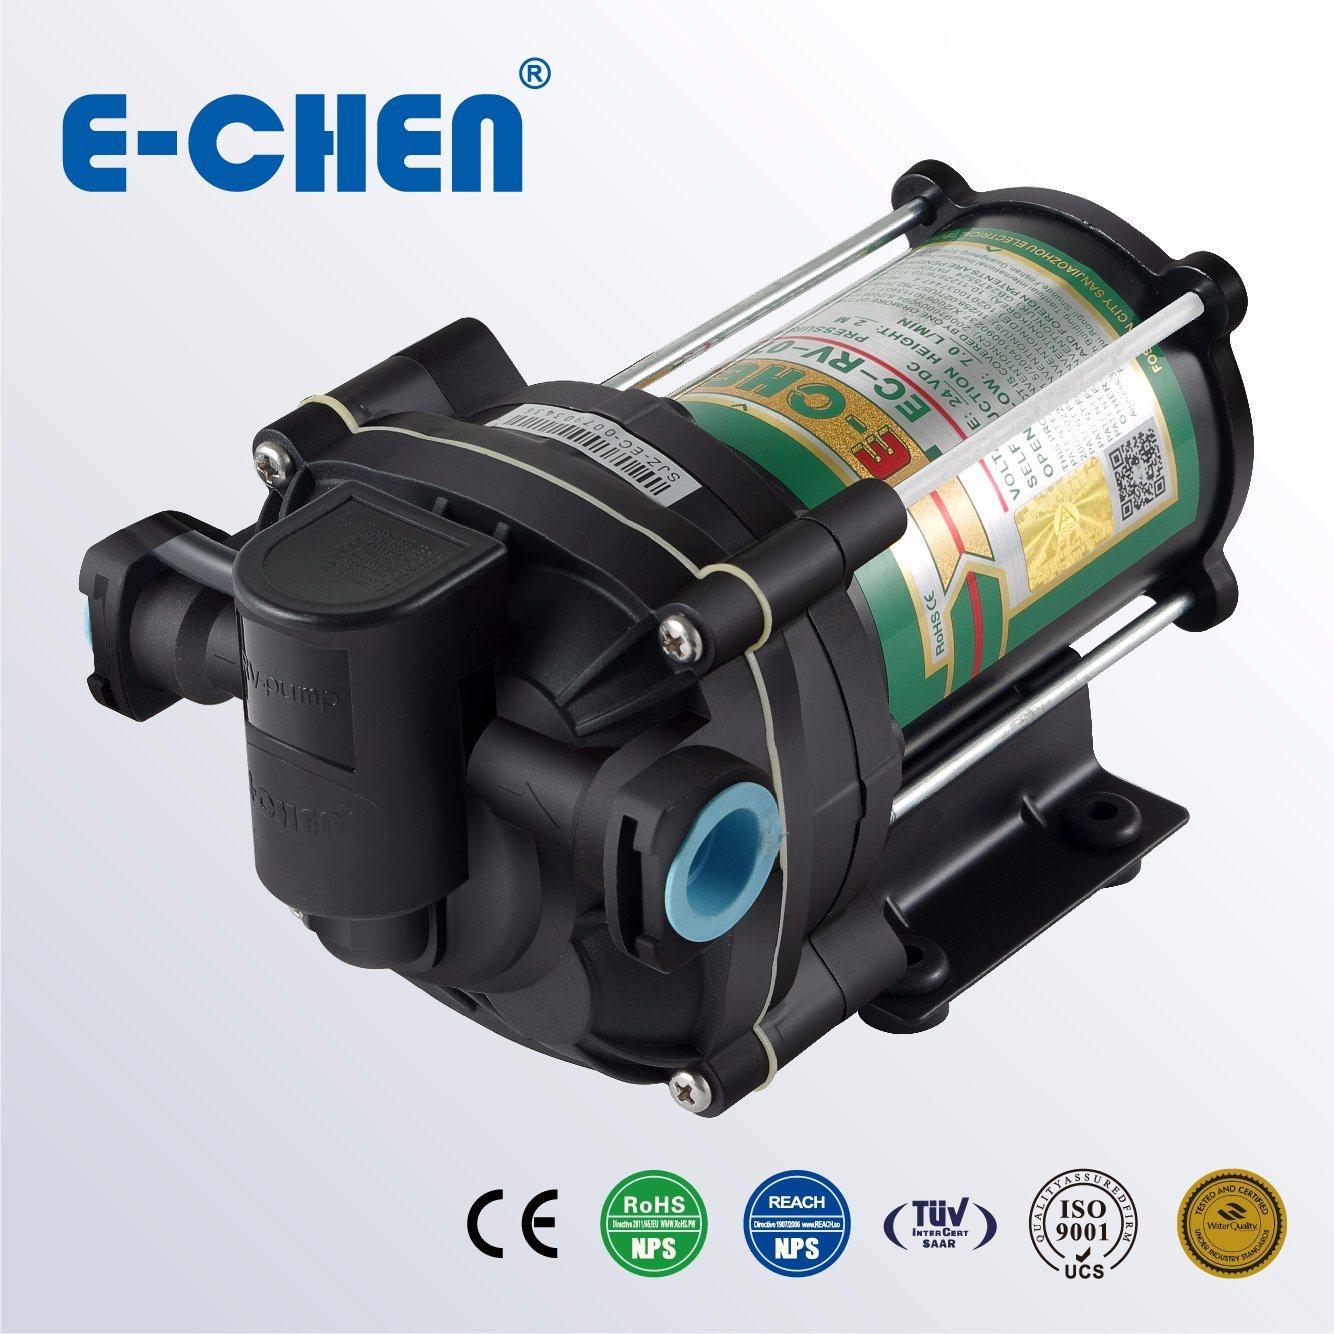 E-Chen Diaphragm Delivery Pump Open Flow 10L/M 65psi Shut-off Pressure Switch